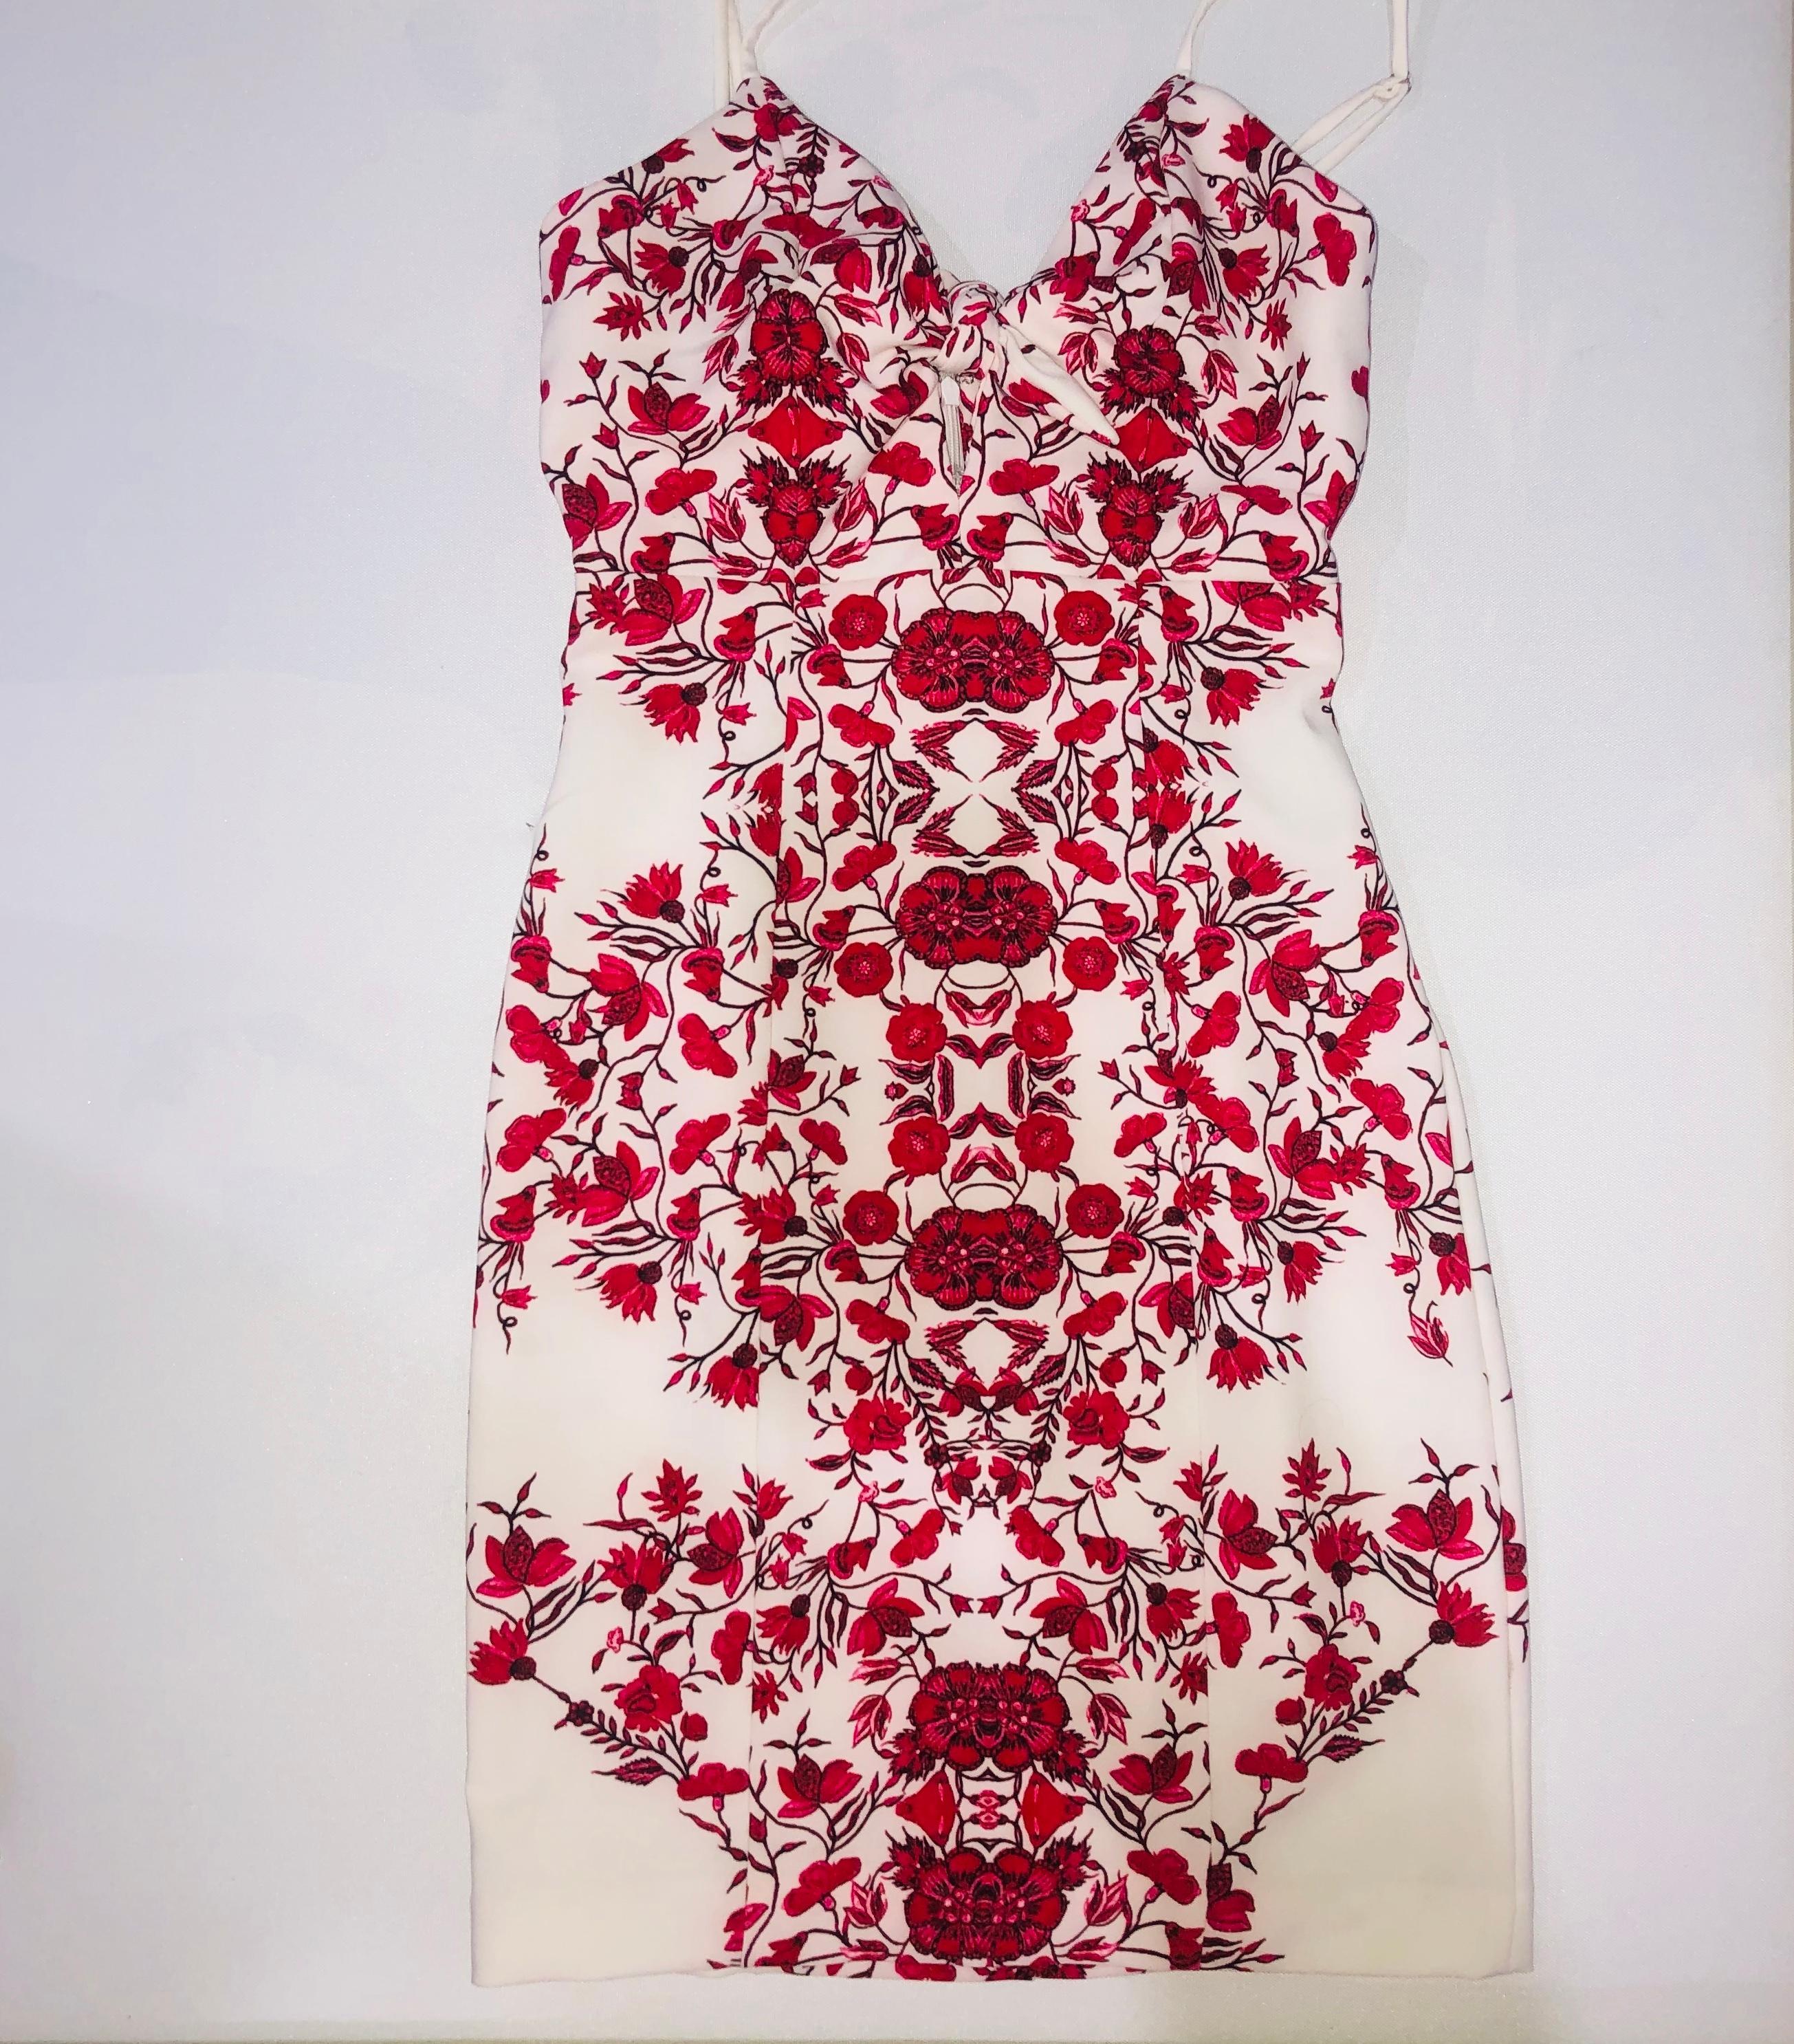 Kookai Wildflower Dress Red Floral Size 8  d1cf19973